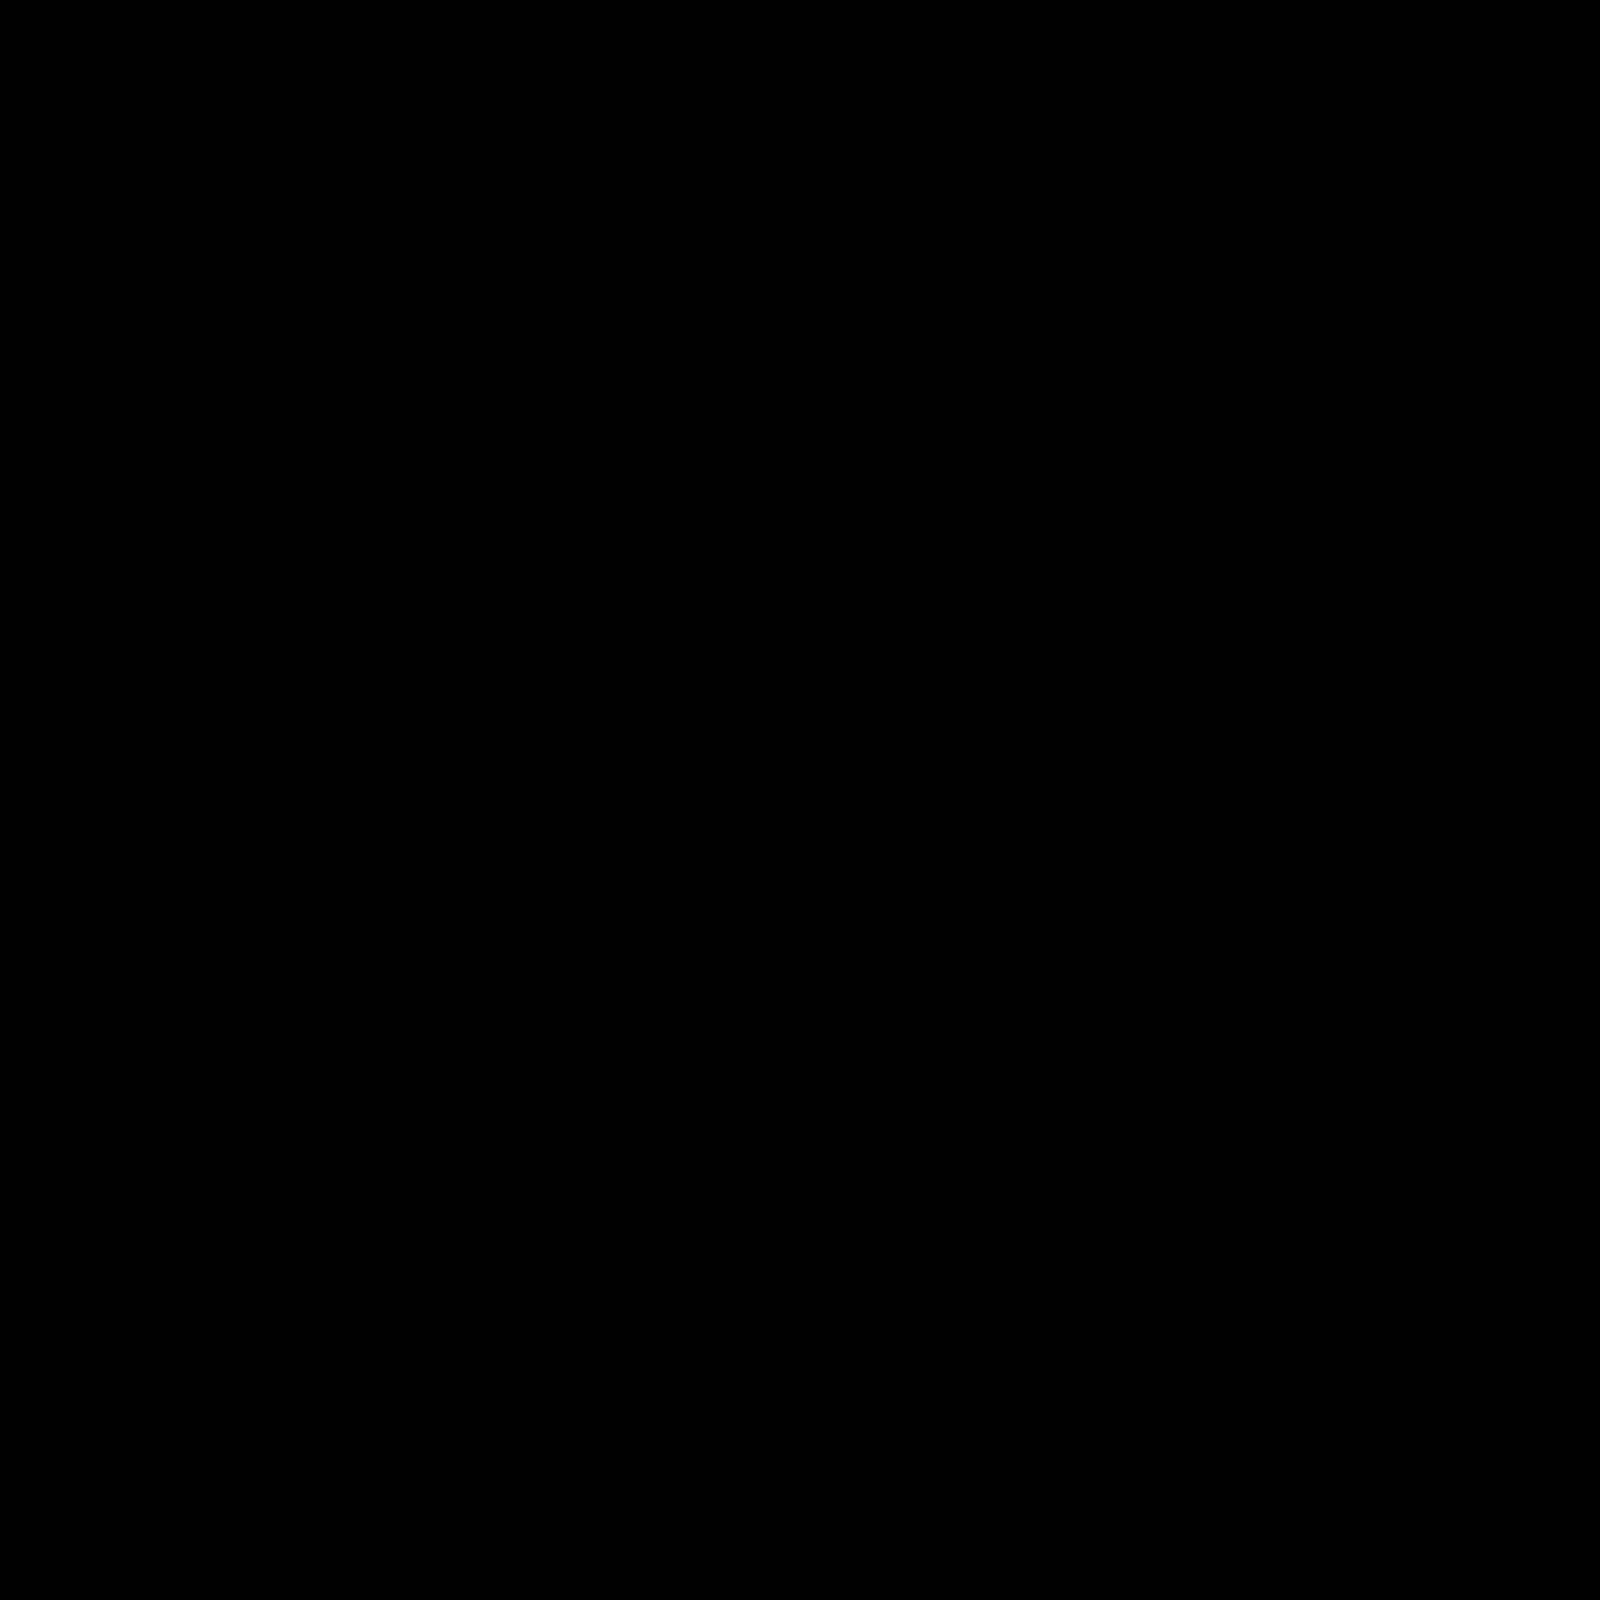 Pink Cross PNG HD - 121763